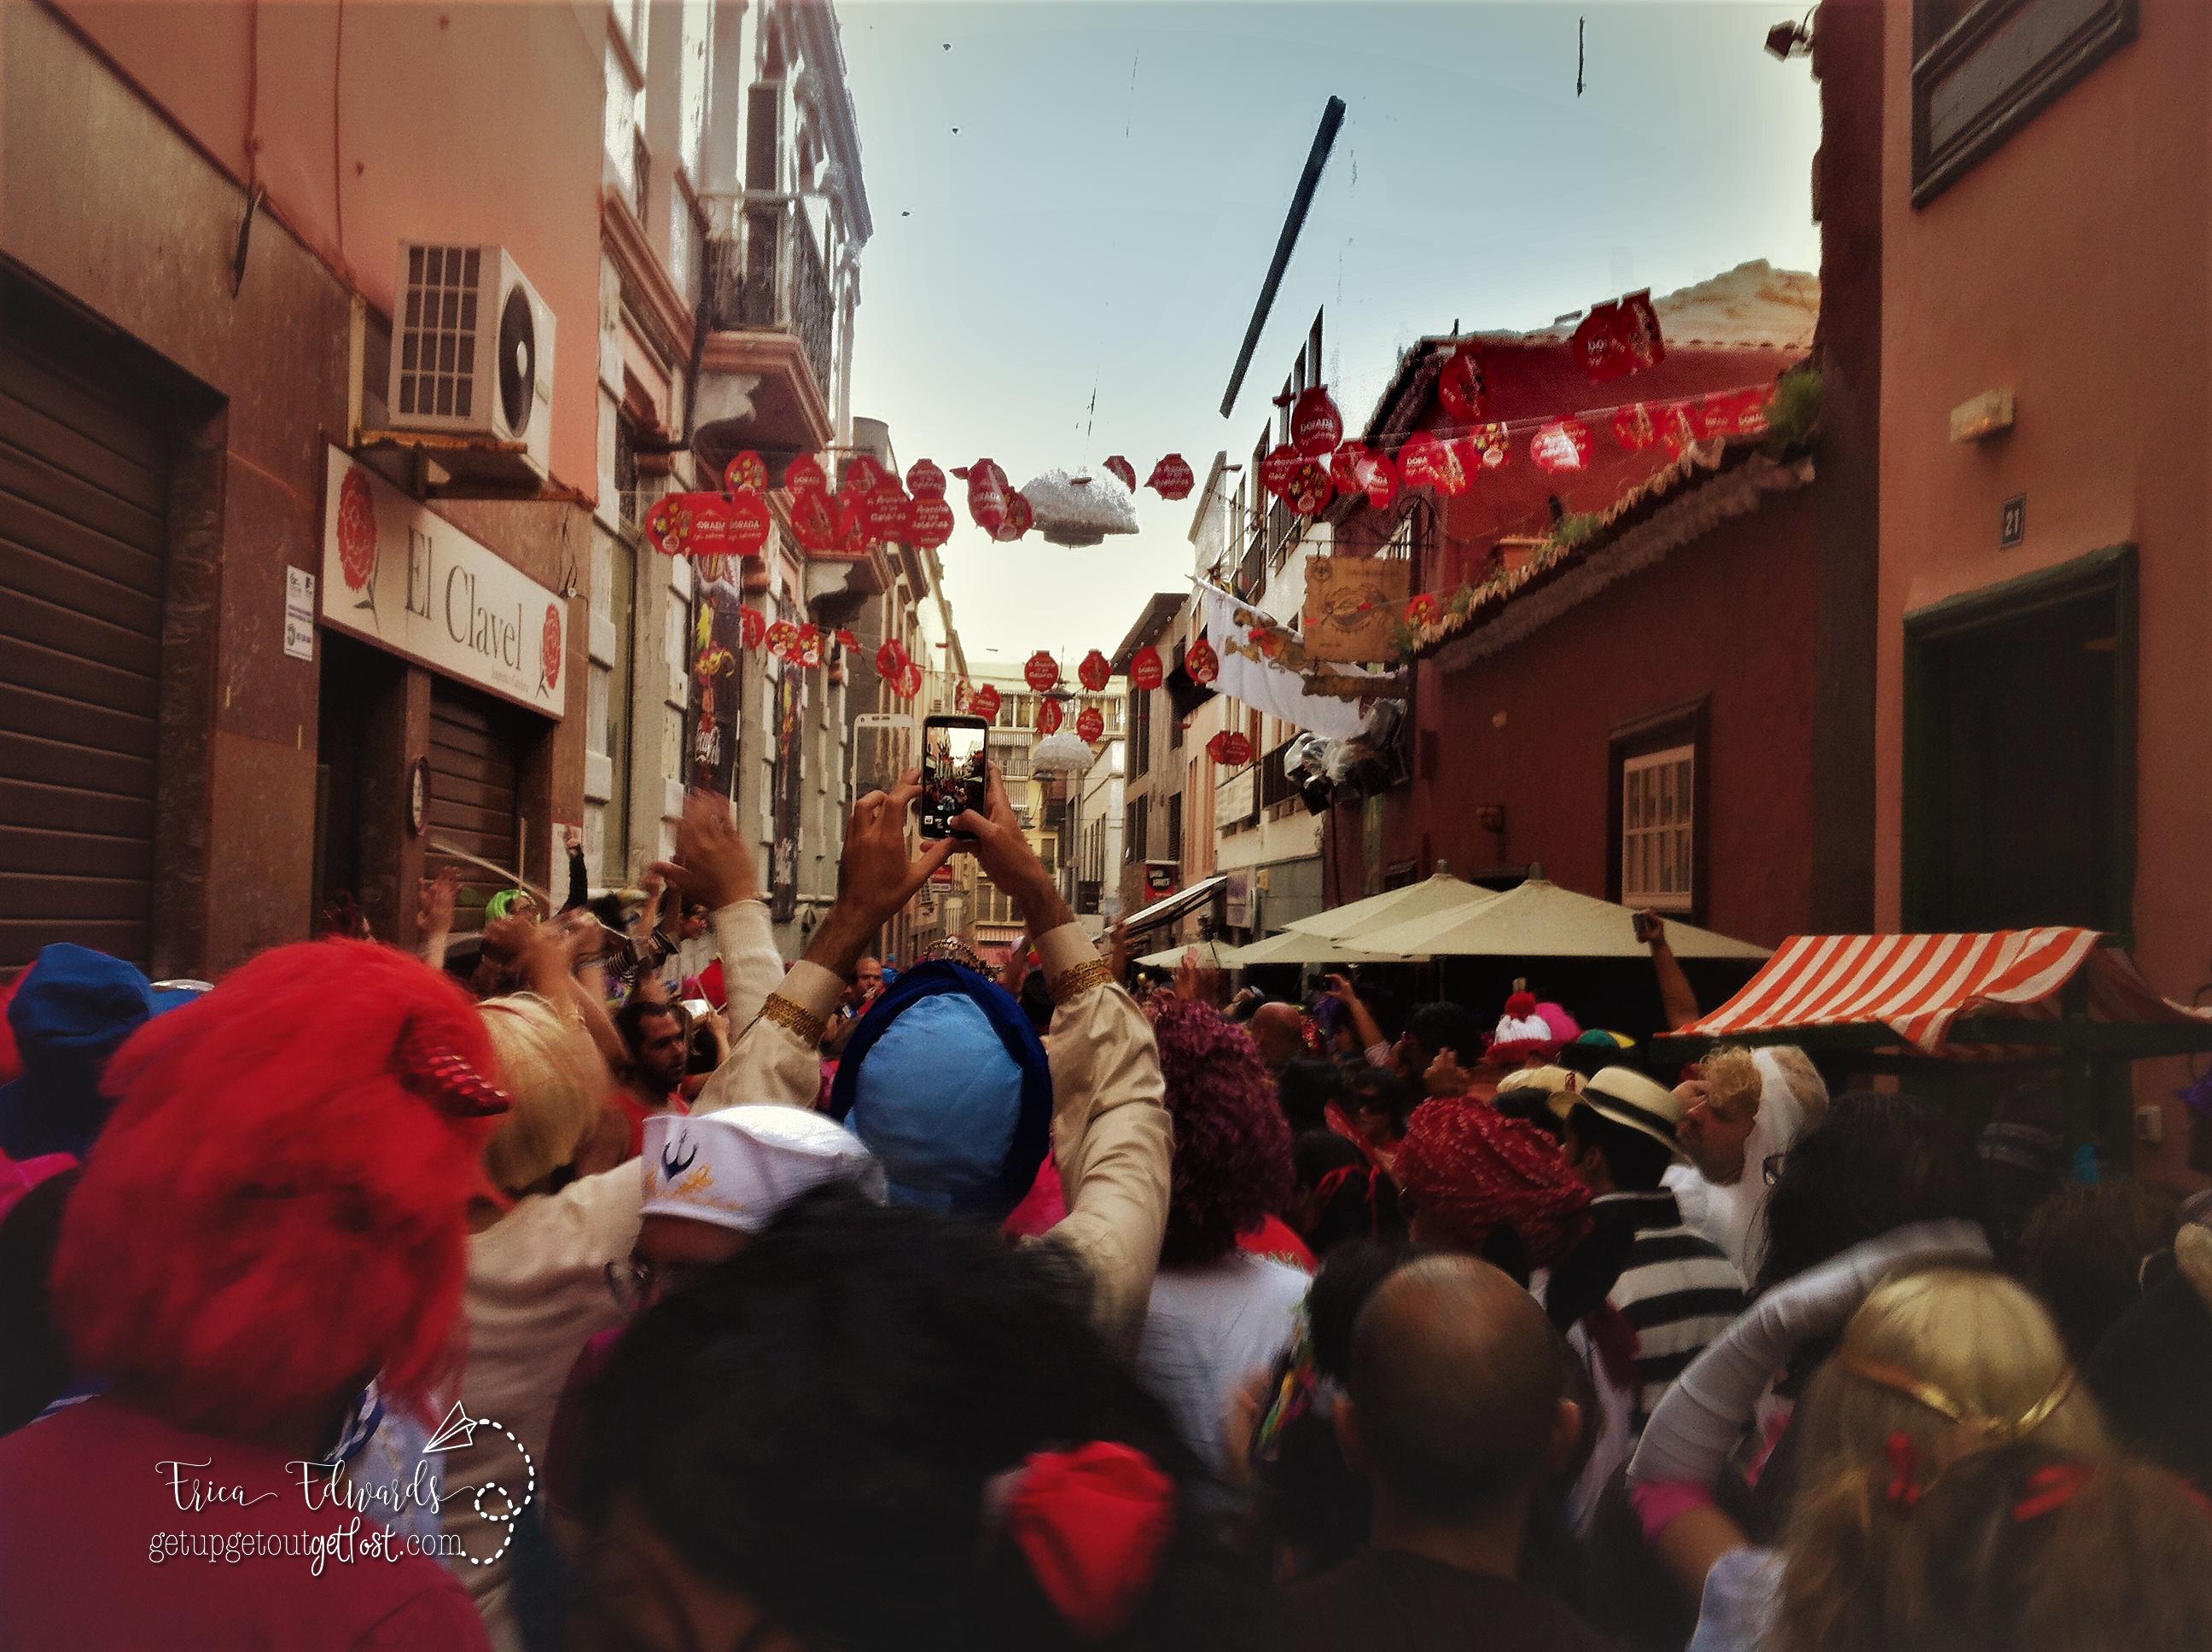 Carnaval de Santa Cruz de Tenerife: The Biggest Bash in the Canary Islands